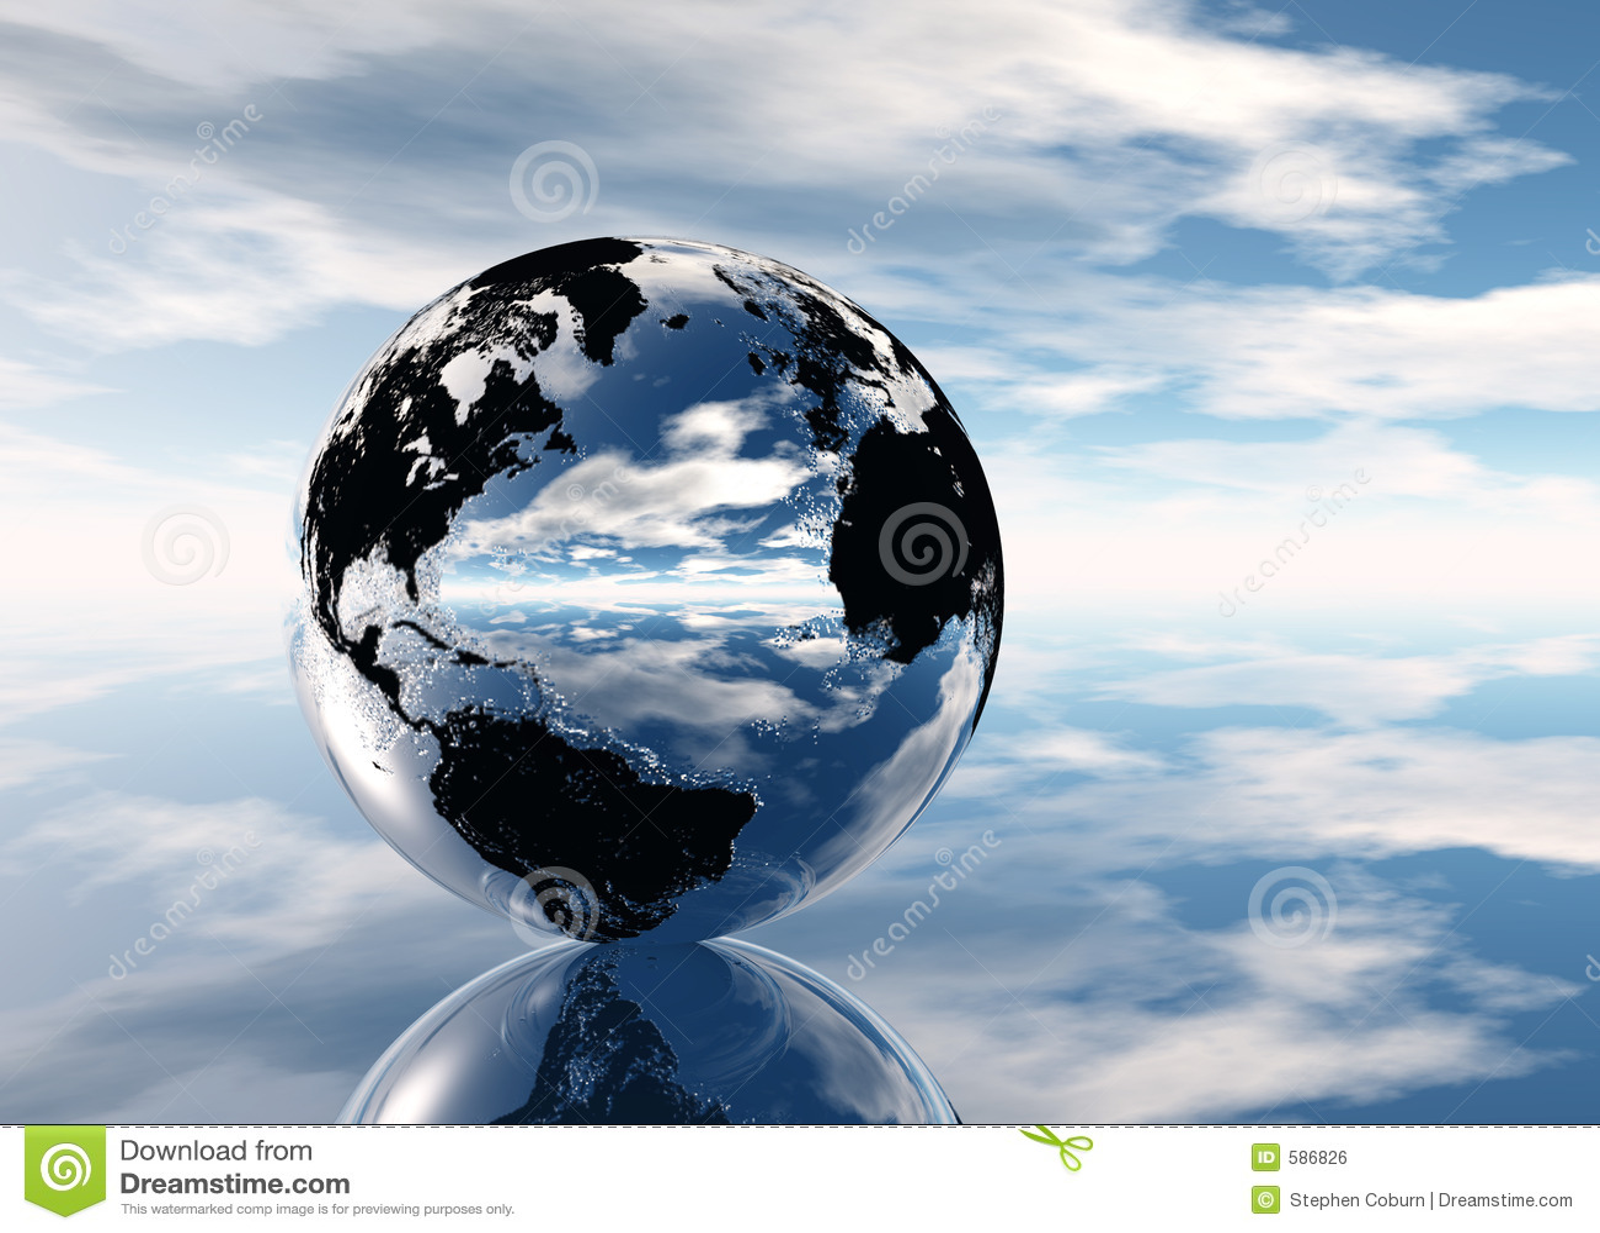 Pixelized Earth